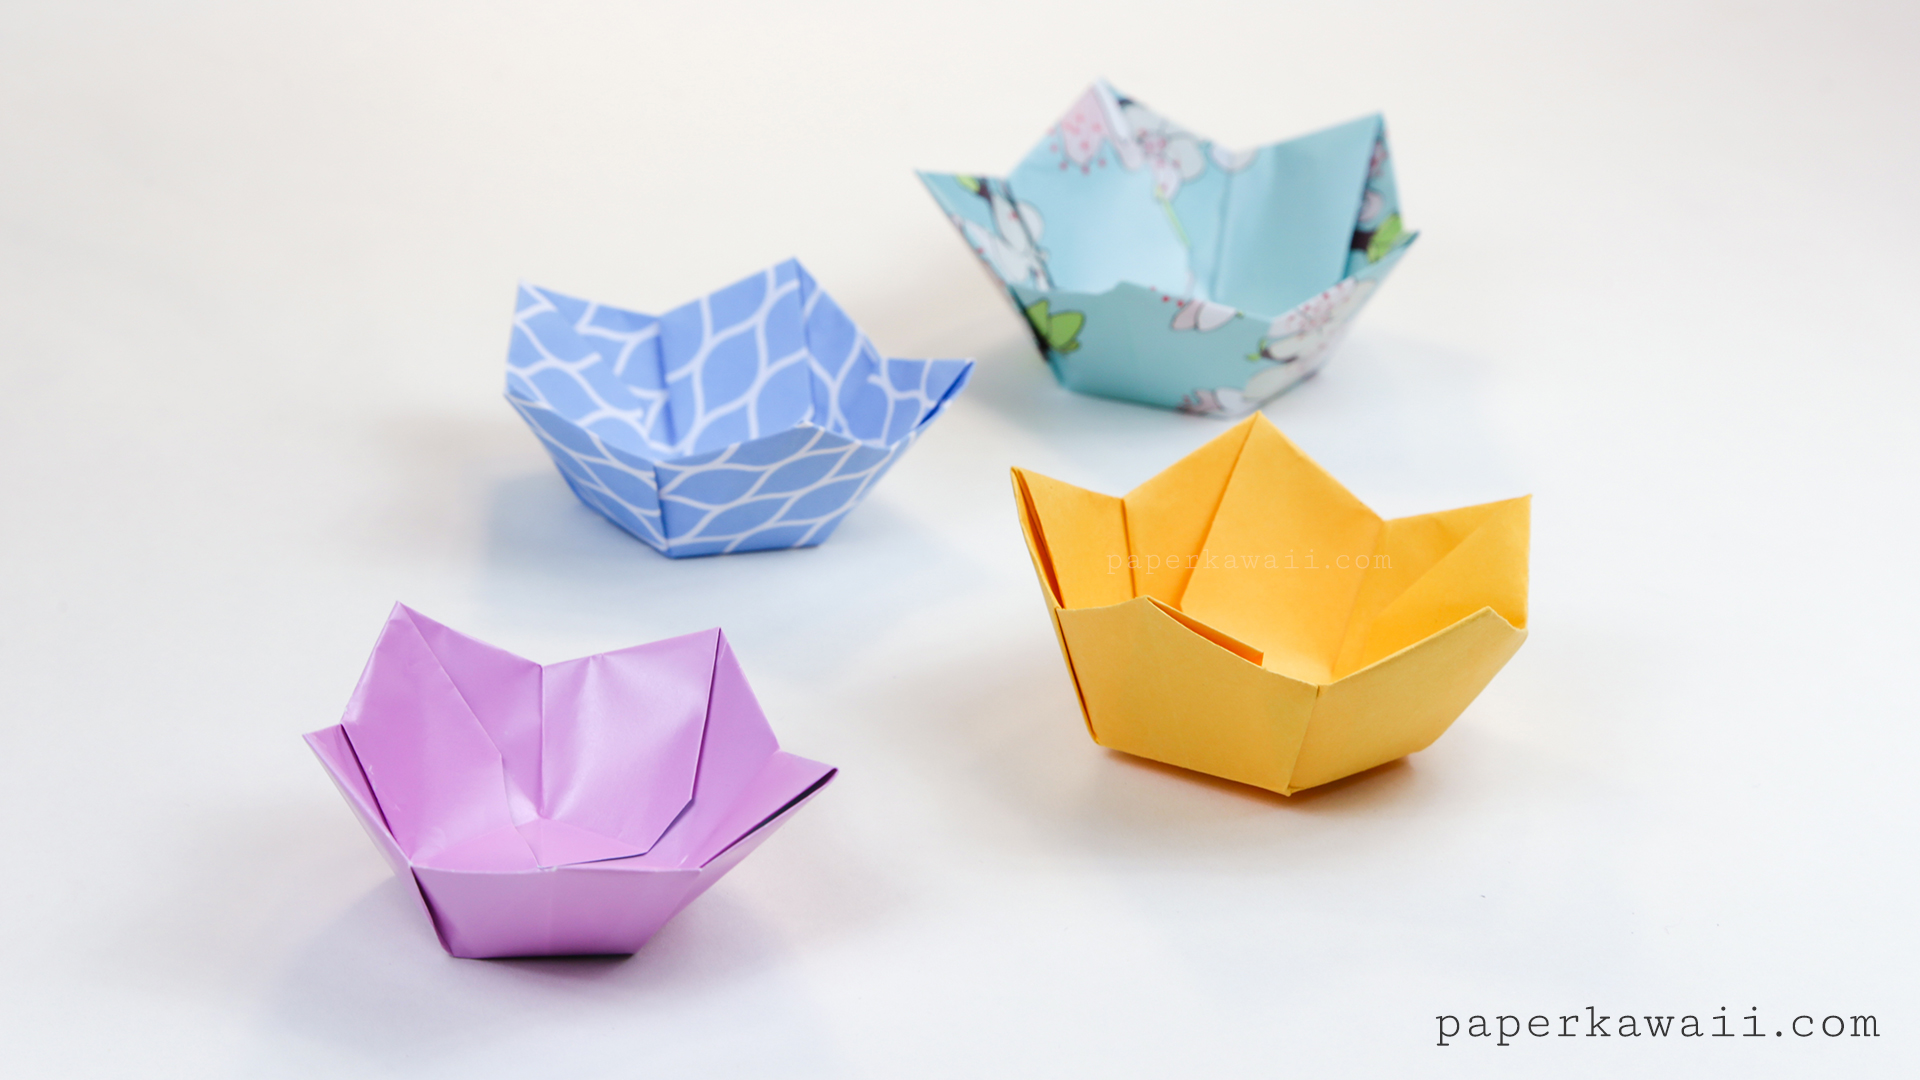 Origami Flower Bowl Tutorial - Paper Kawaii - photo#15